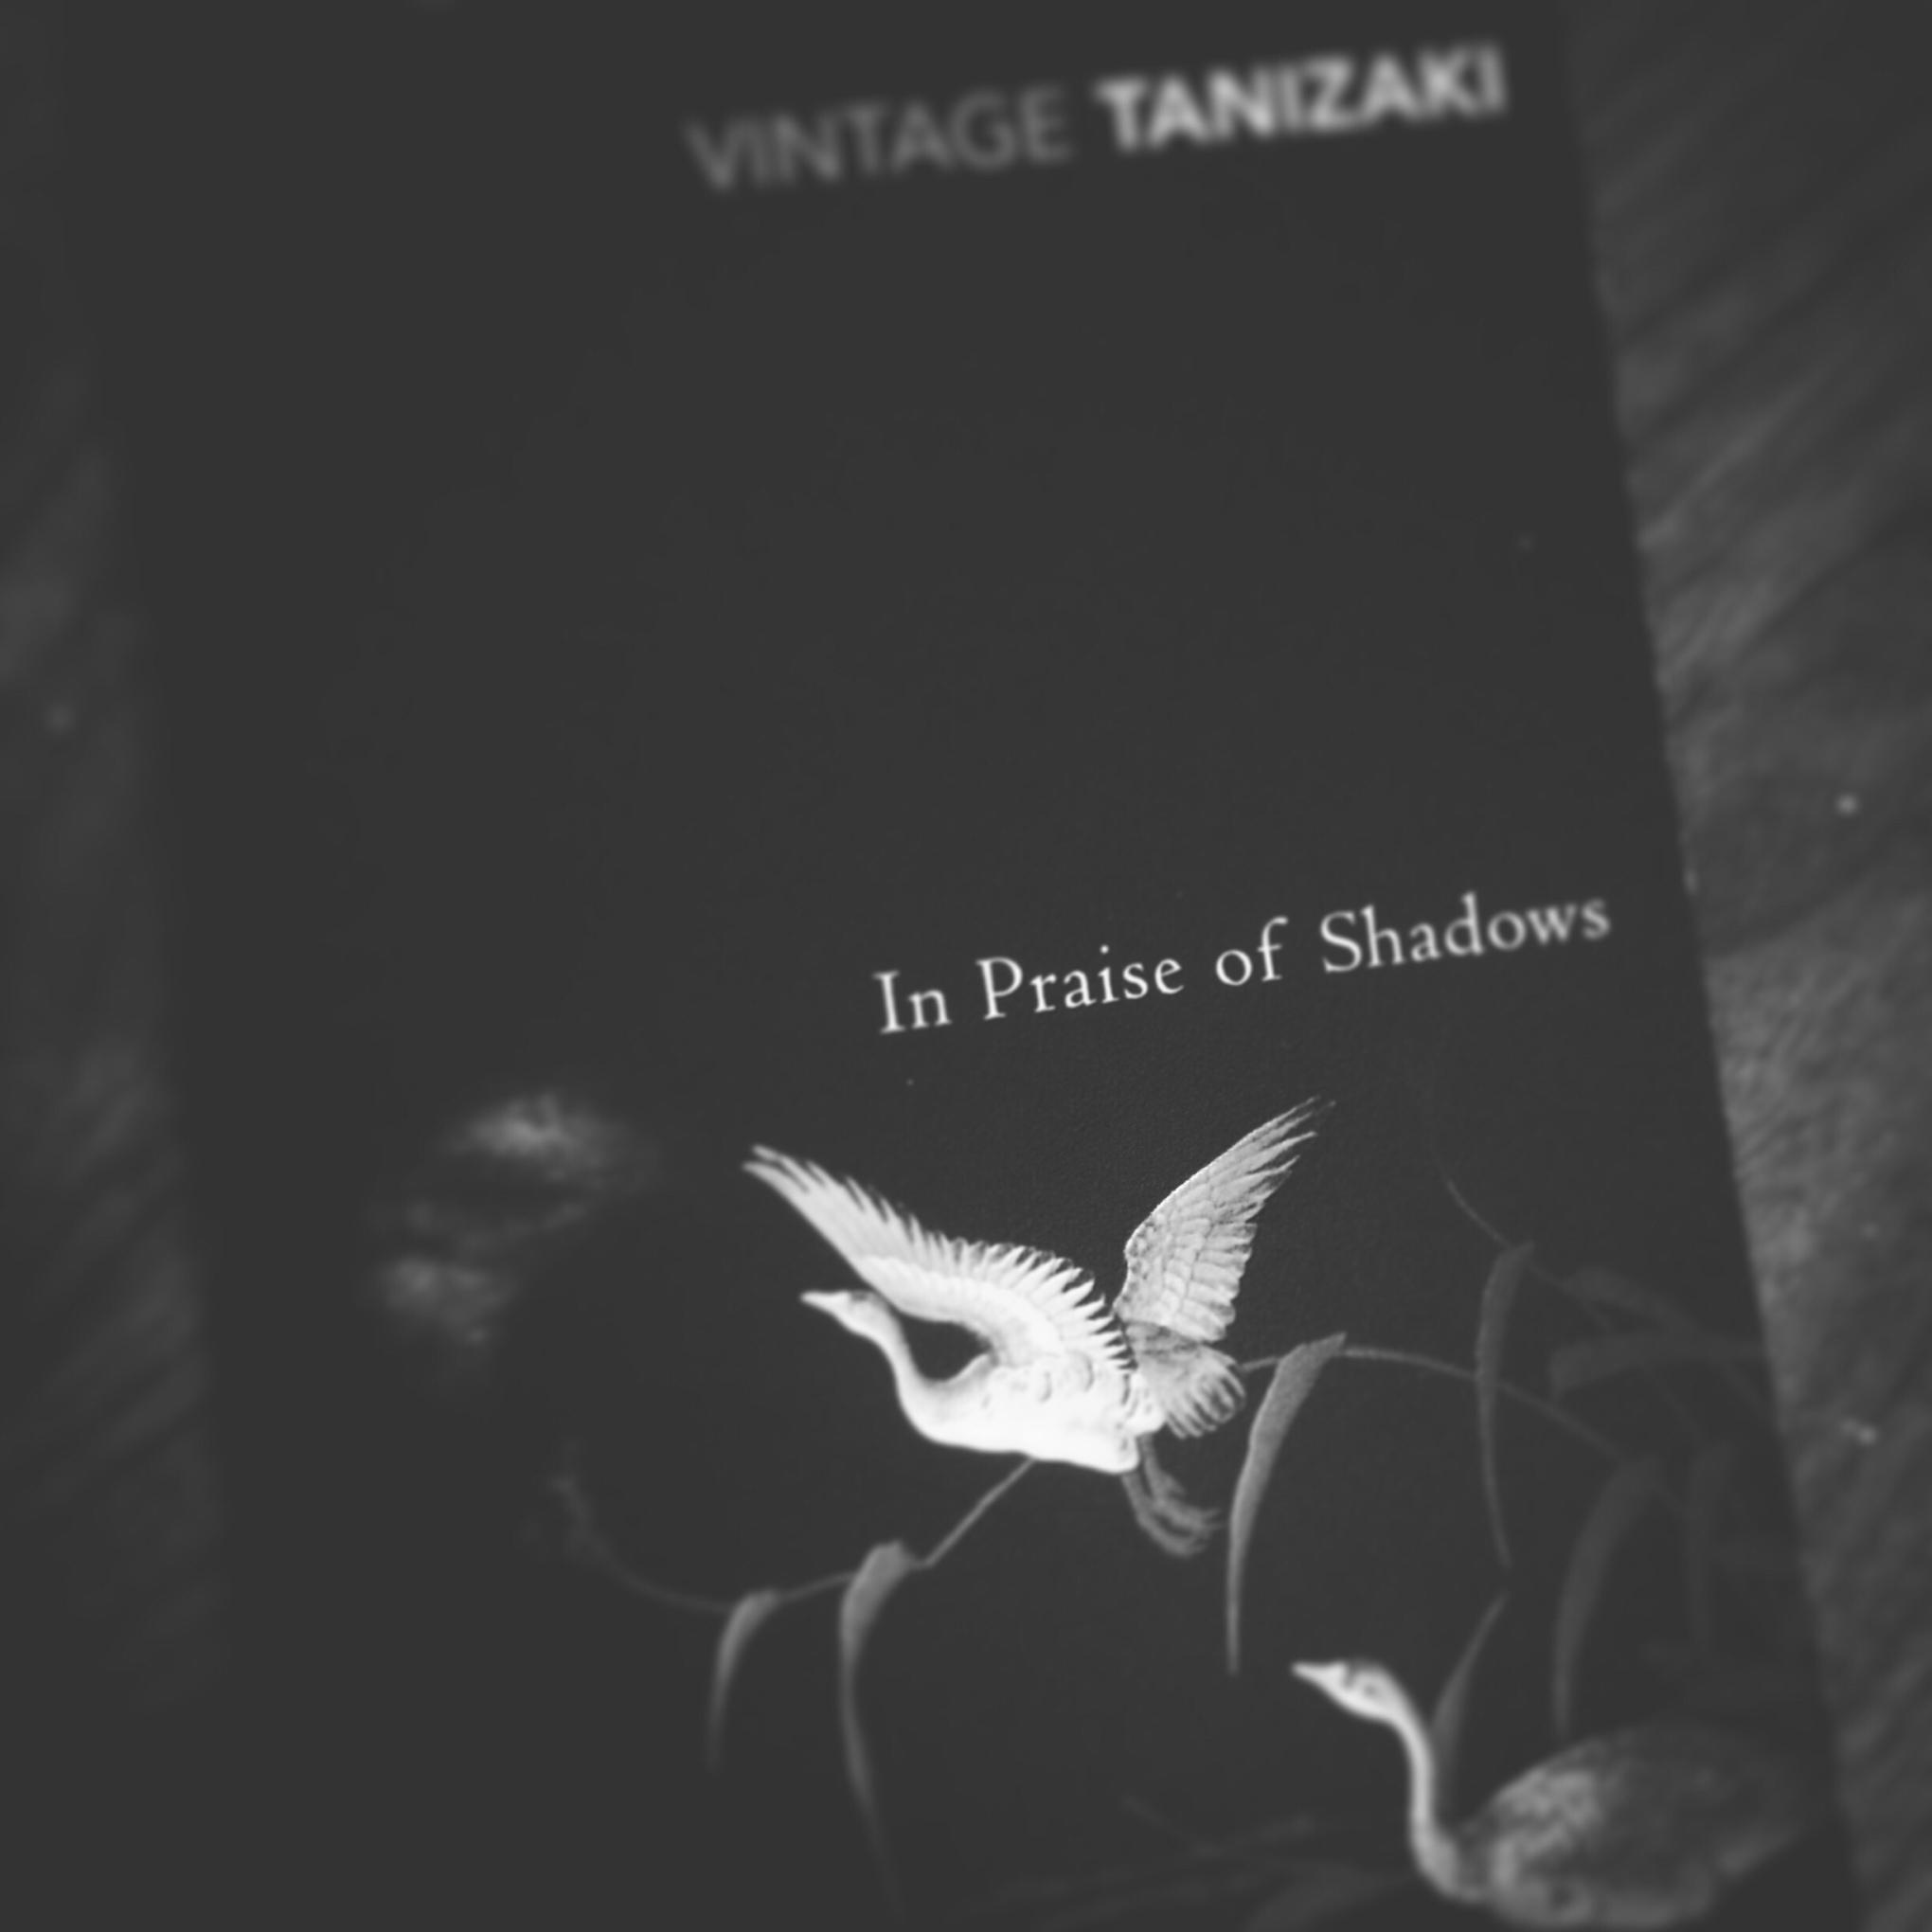 In Praise of Shadows by Jun'ichirō Tanizaki